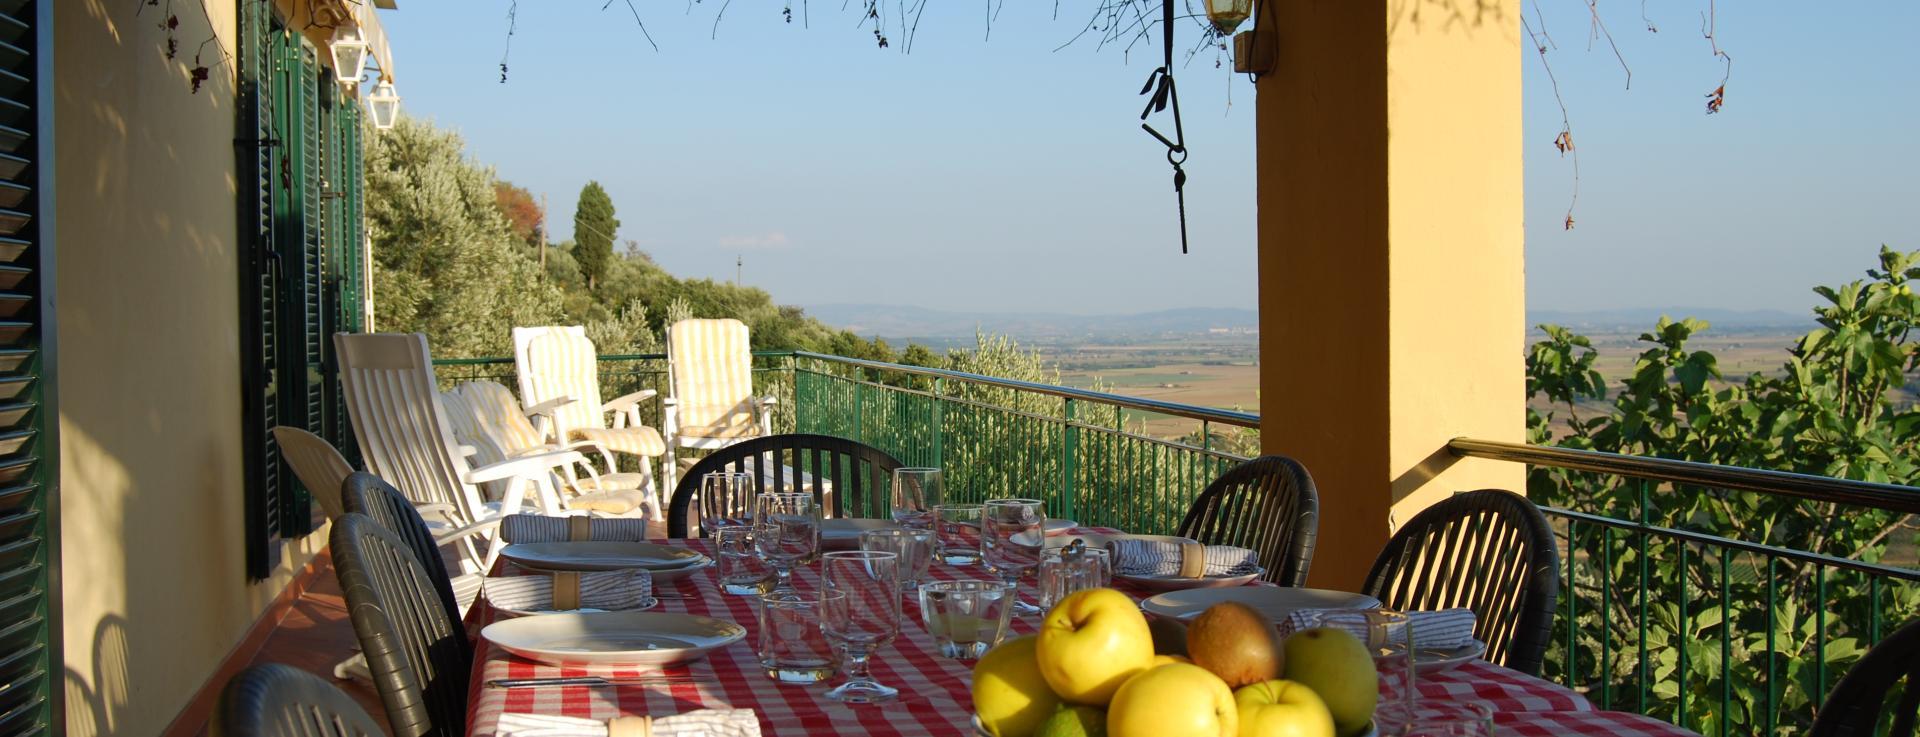 Terrace dining, Cancello Rosso, Tuscany, Italy